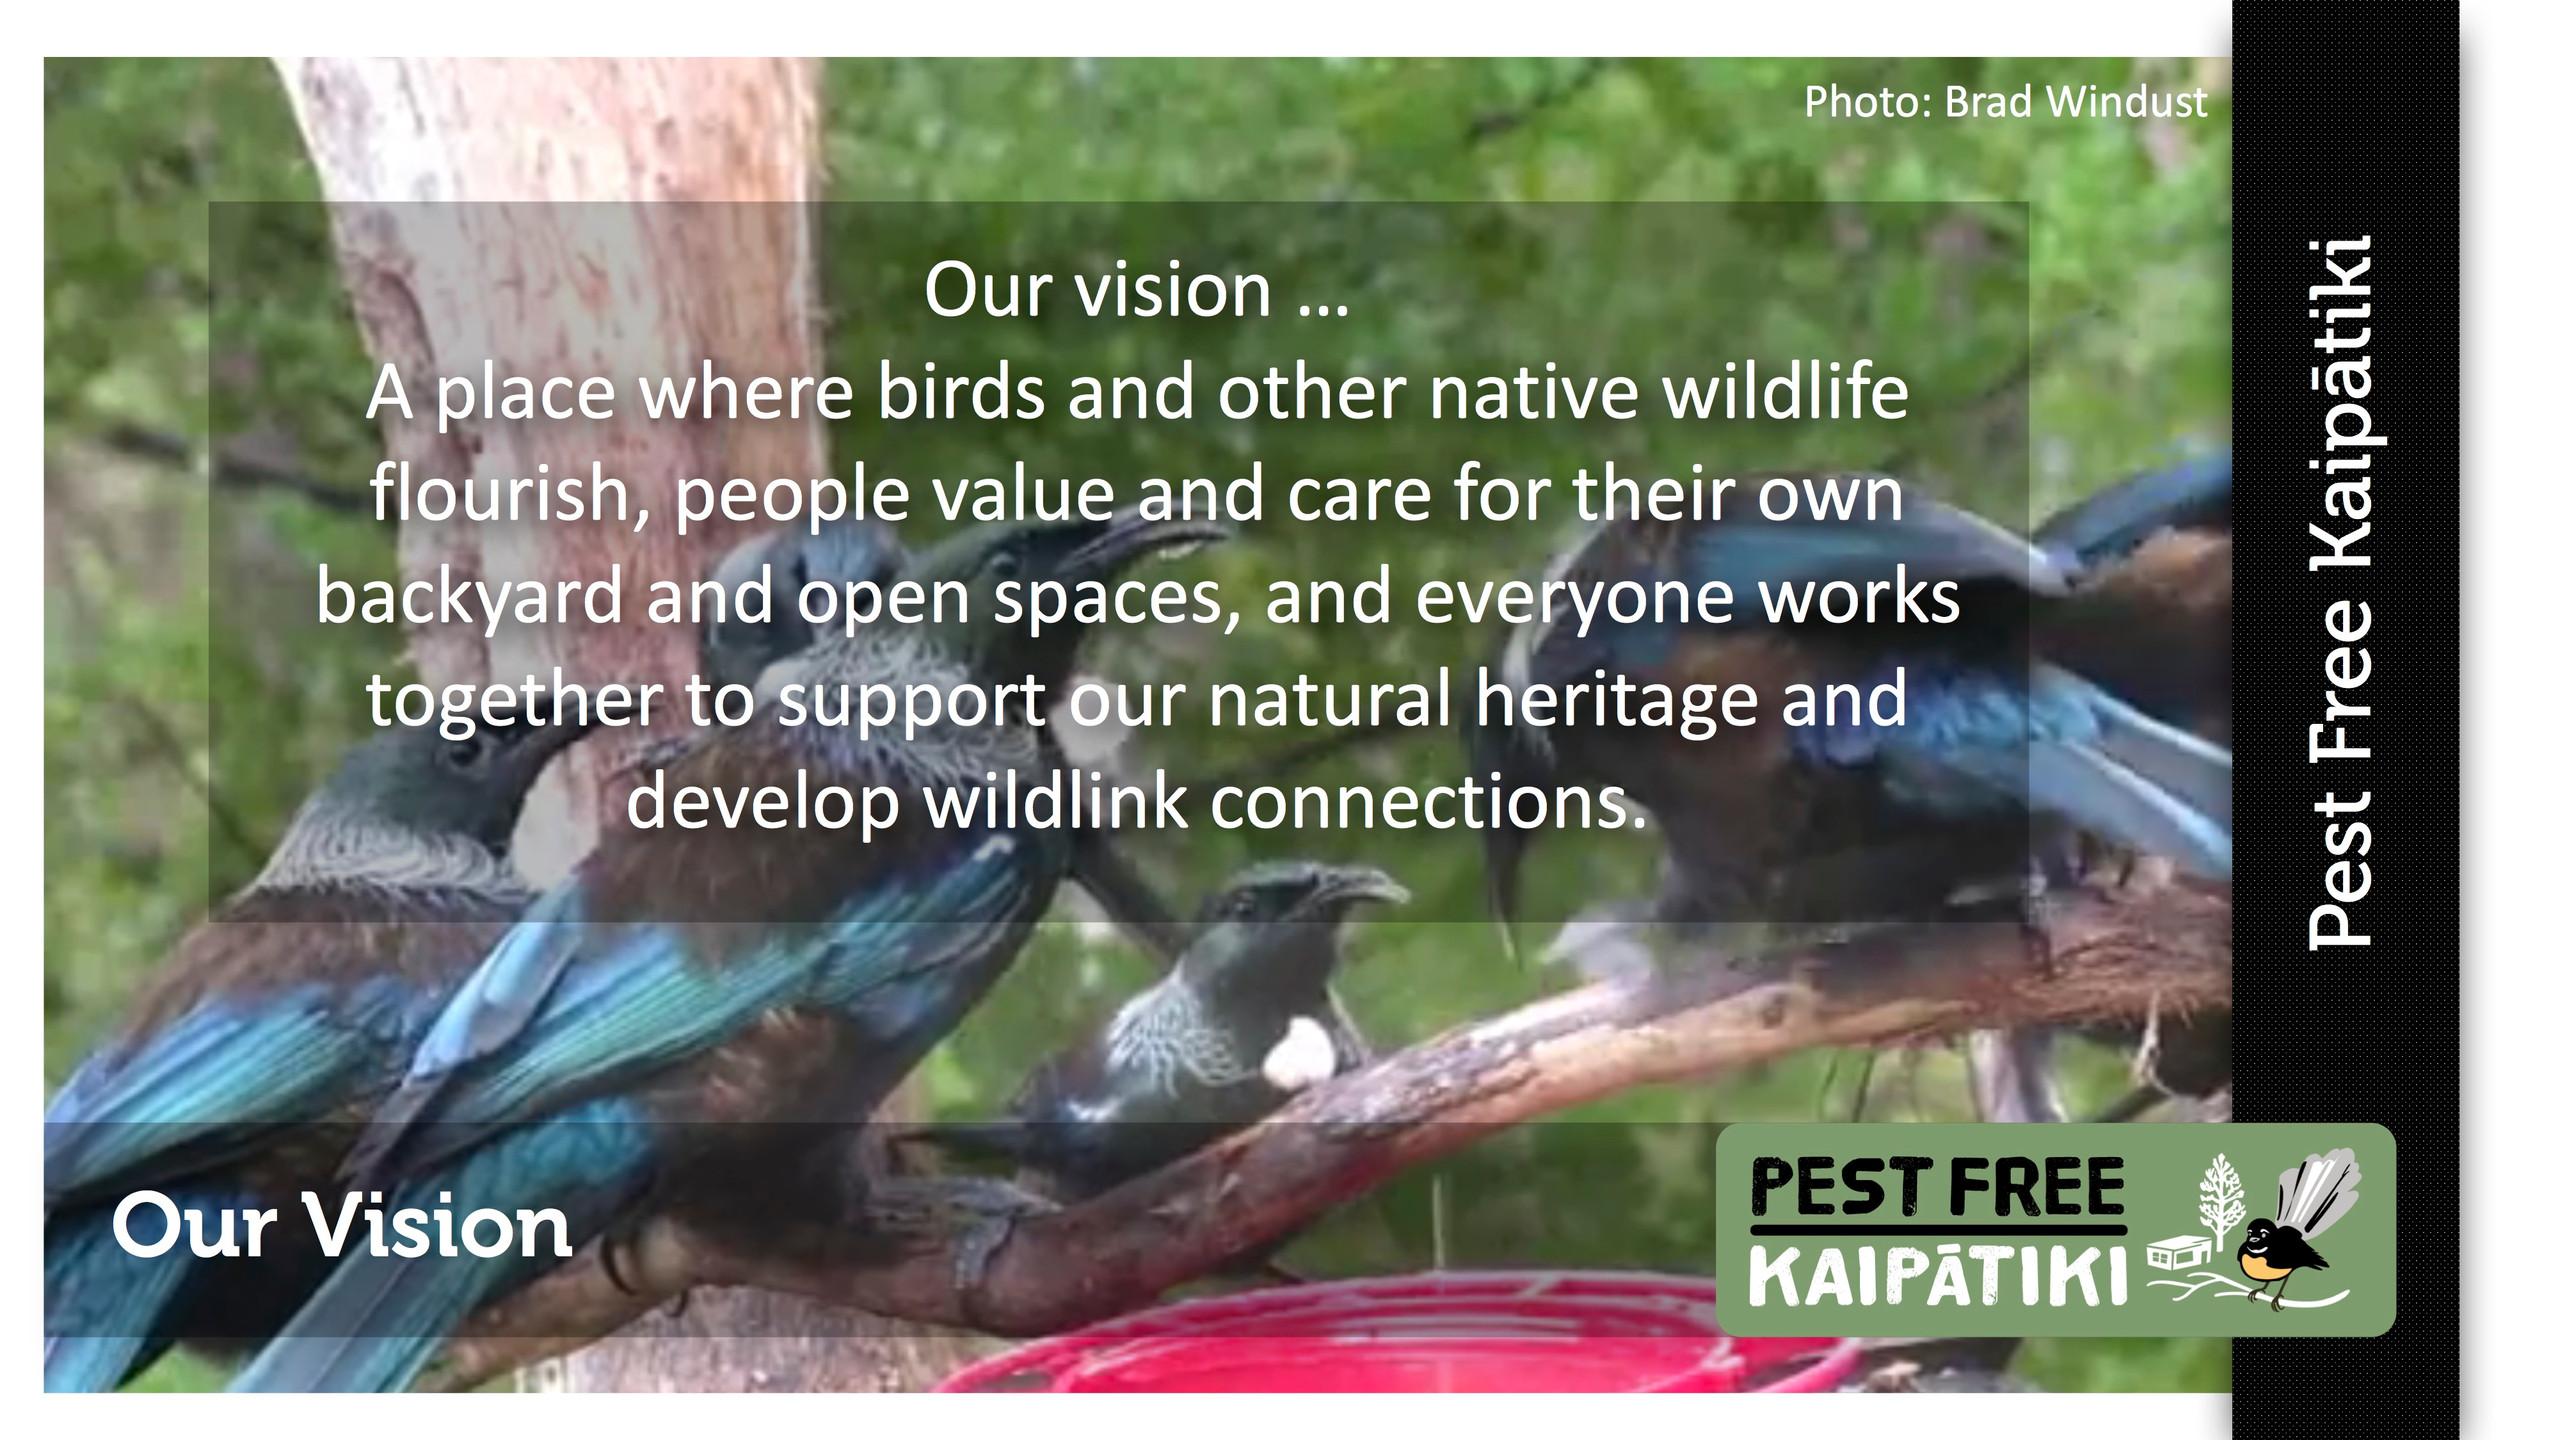 Pest Free Kaipatiki-Pestival-slide4